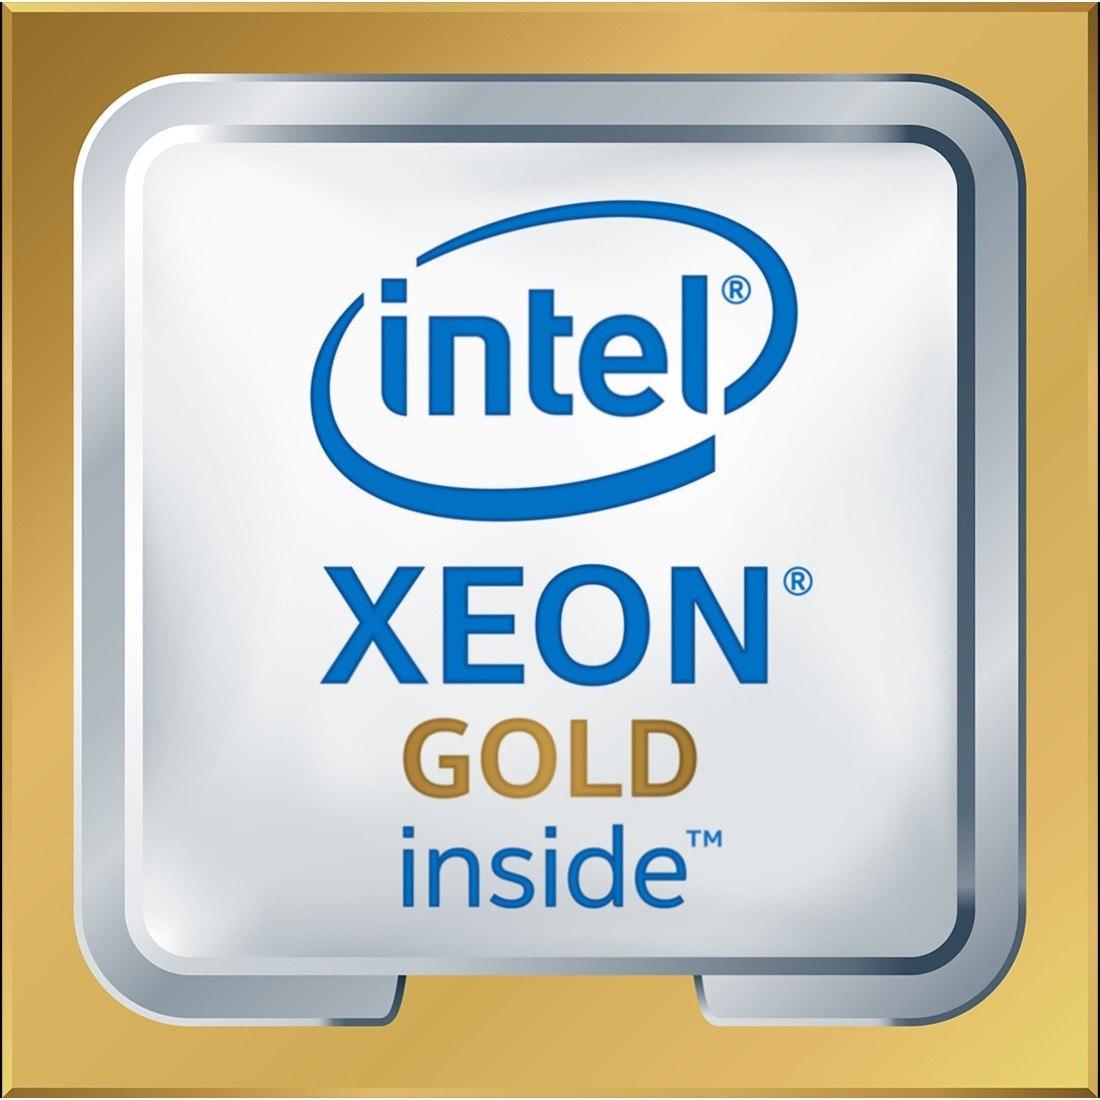 Intel Xeon 6138 Icosa-core (20 Core) 2 GHz Processor - Retail Pack